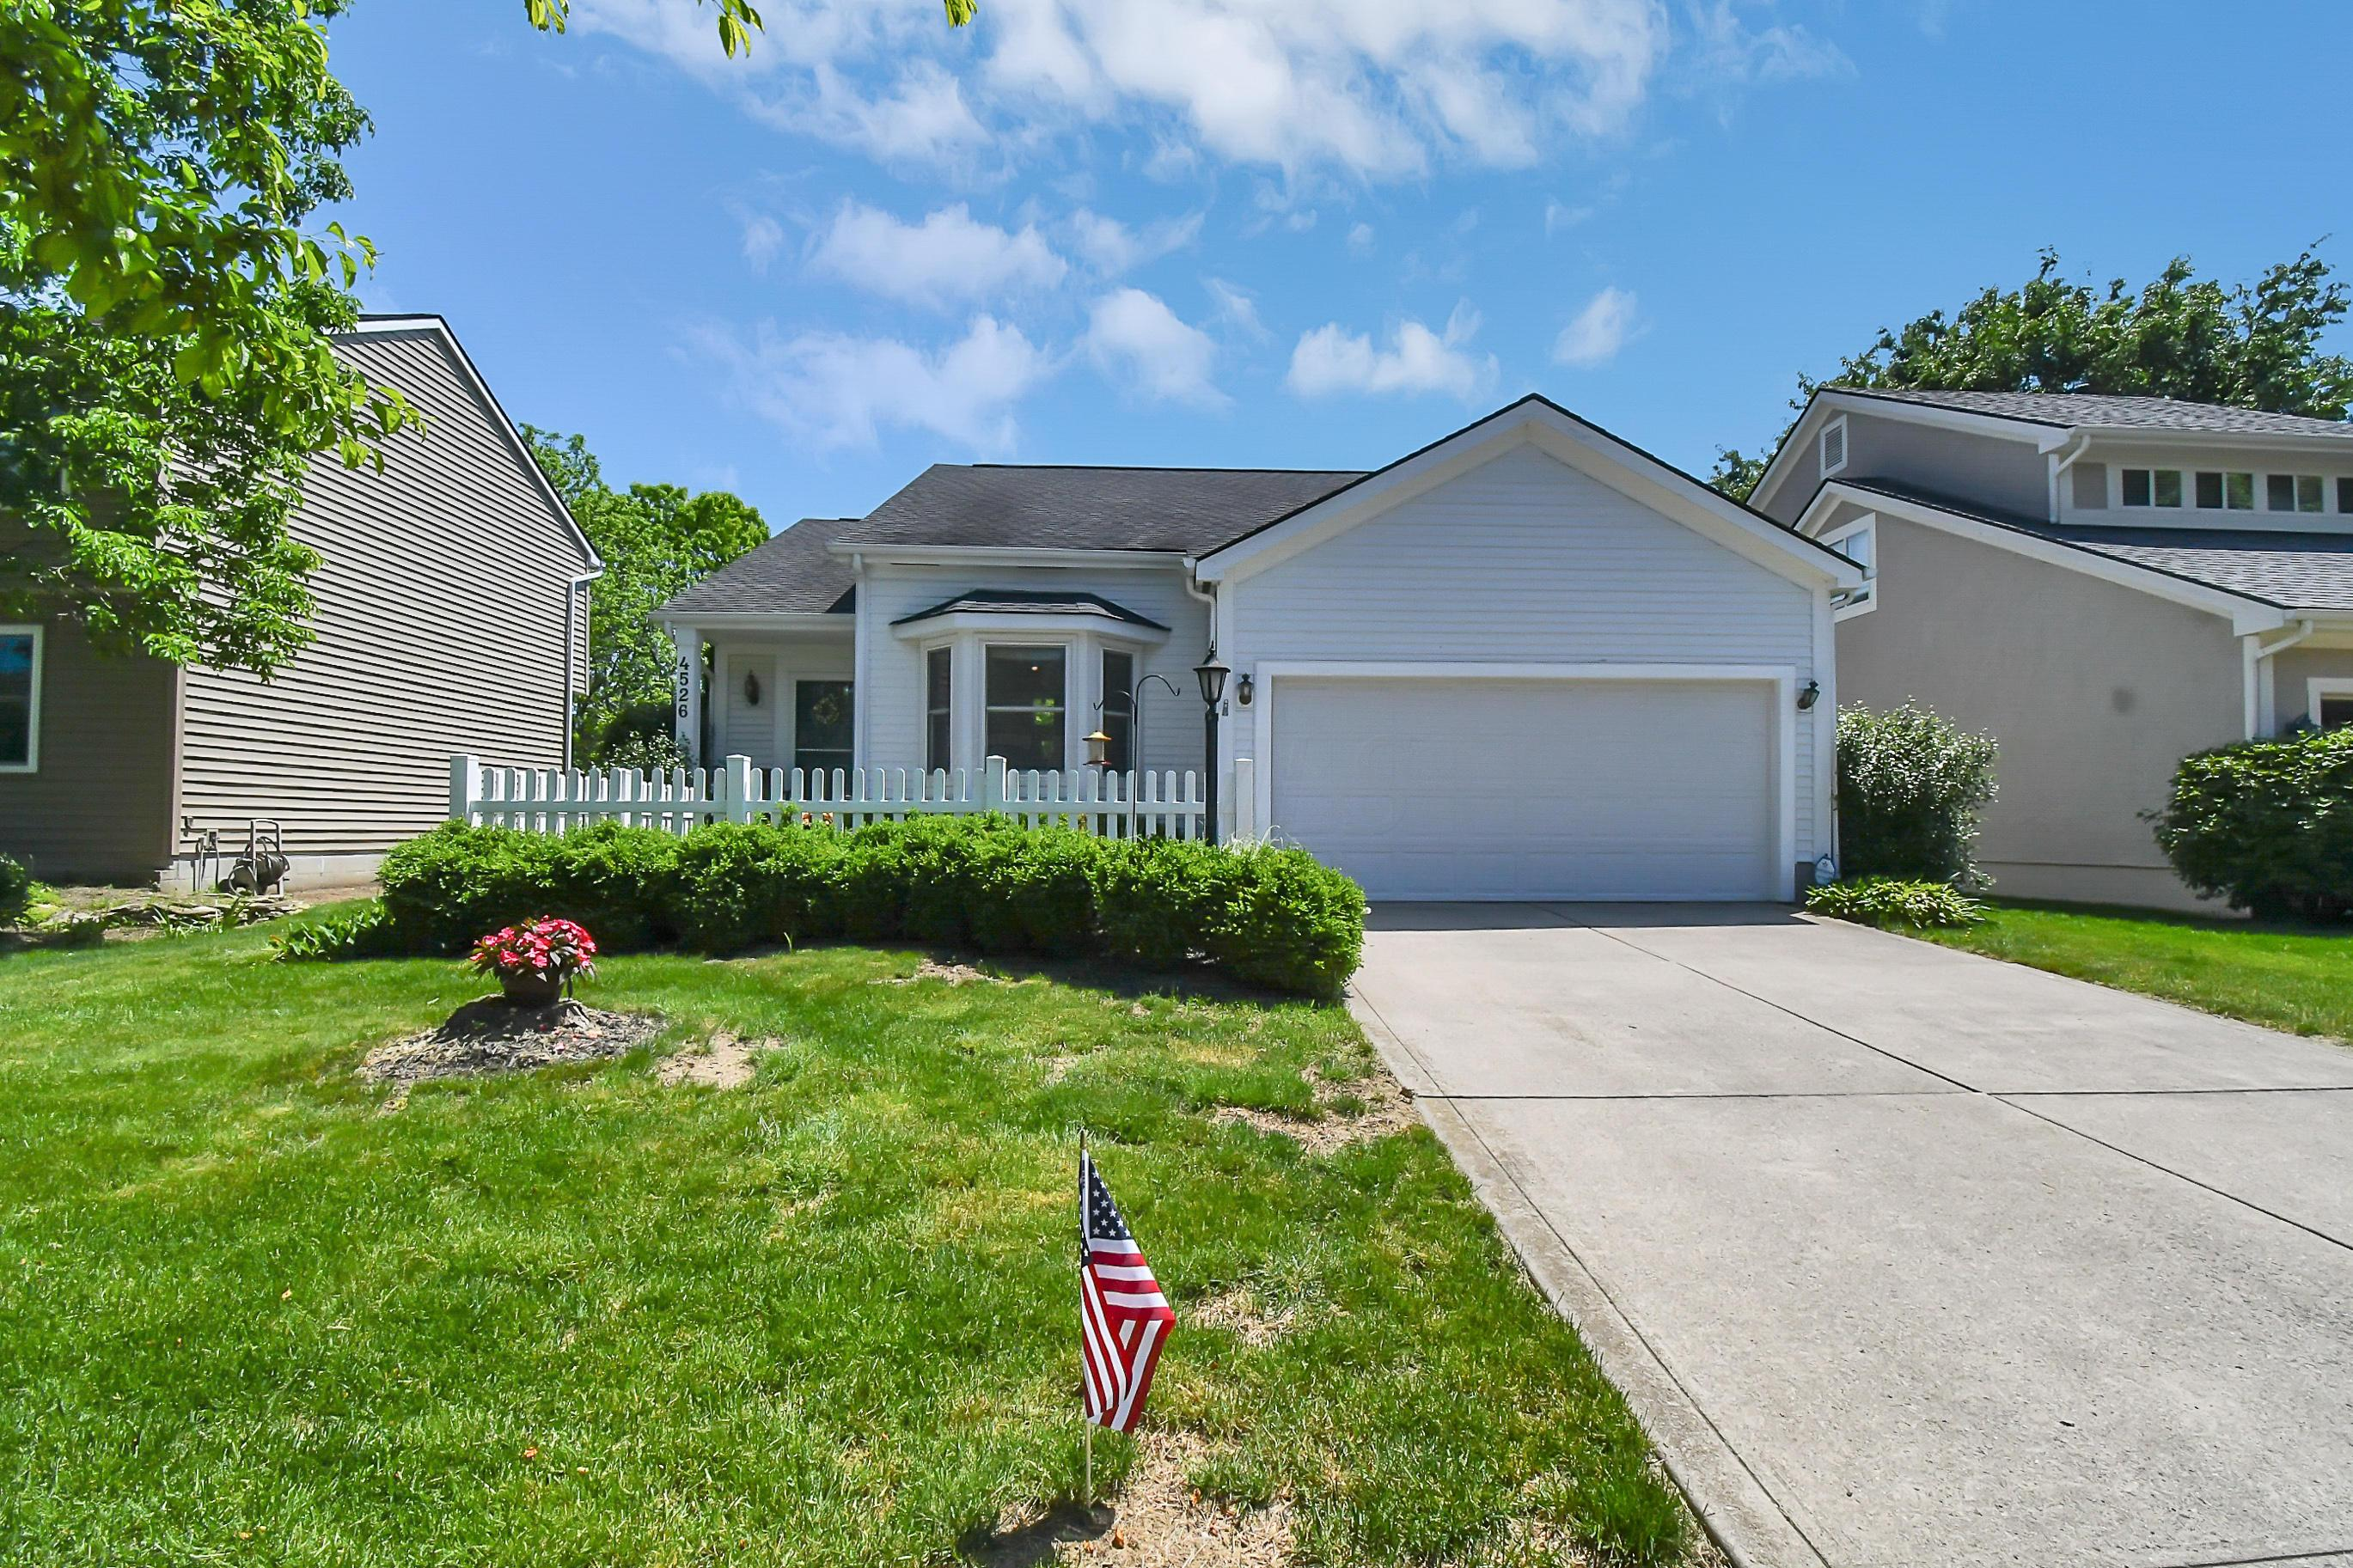 4526 Huckleberry Court, Hilliard, Ohio 43026, 3 Bedrooms Bedrooms, ,2 BathroomsBathrooms,Residential,For Sale,Huckleberry,220018134